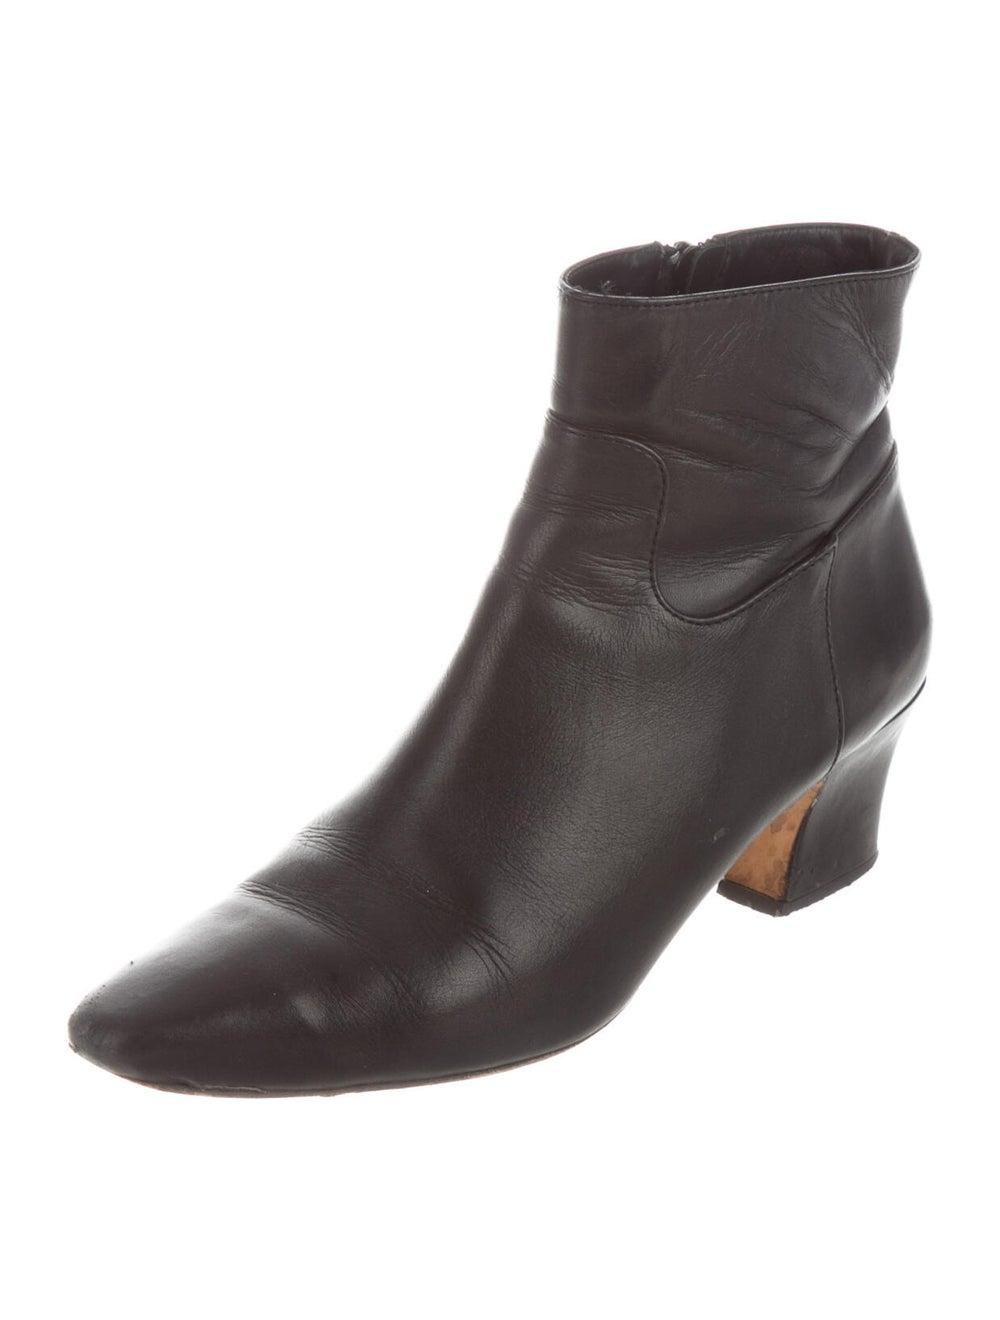 Miista Leather Boots Black - image 2